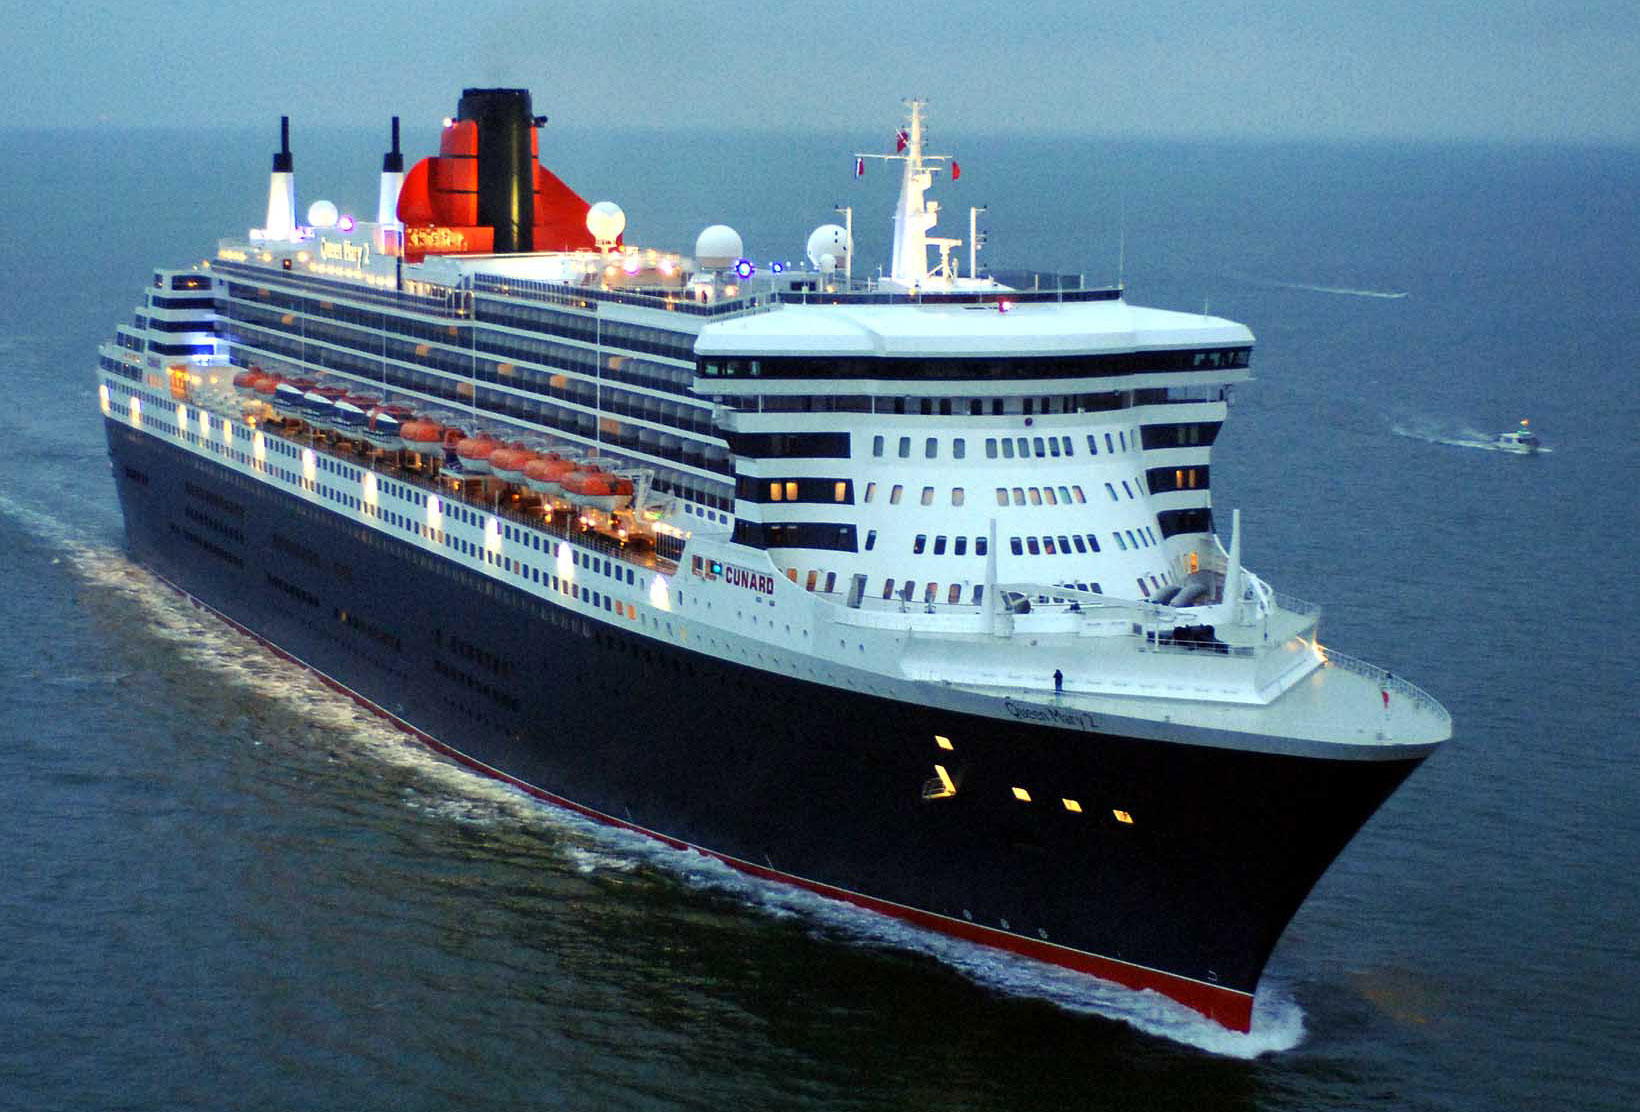 Croaziera 2017 - China - Cunard Line - Queen Mary 2 - 10 Nopti